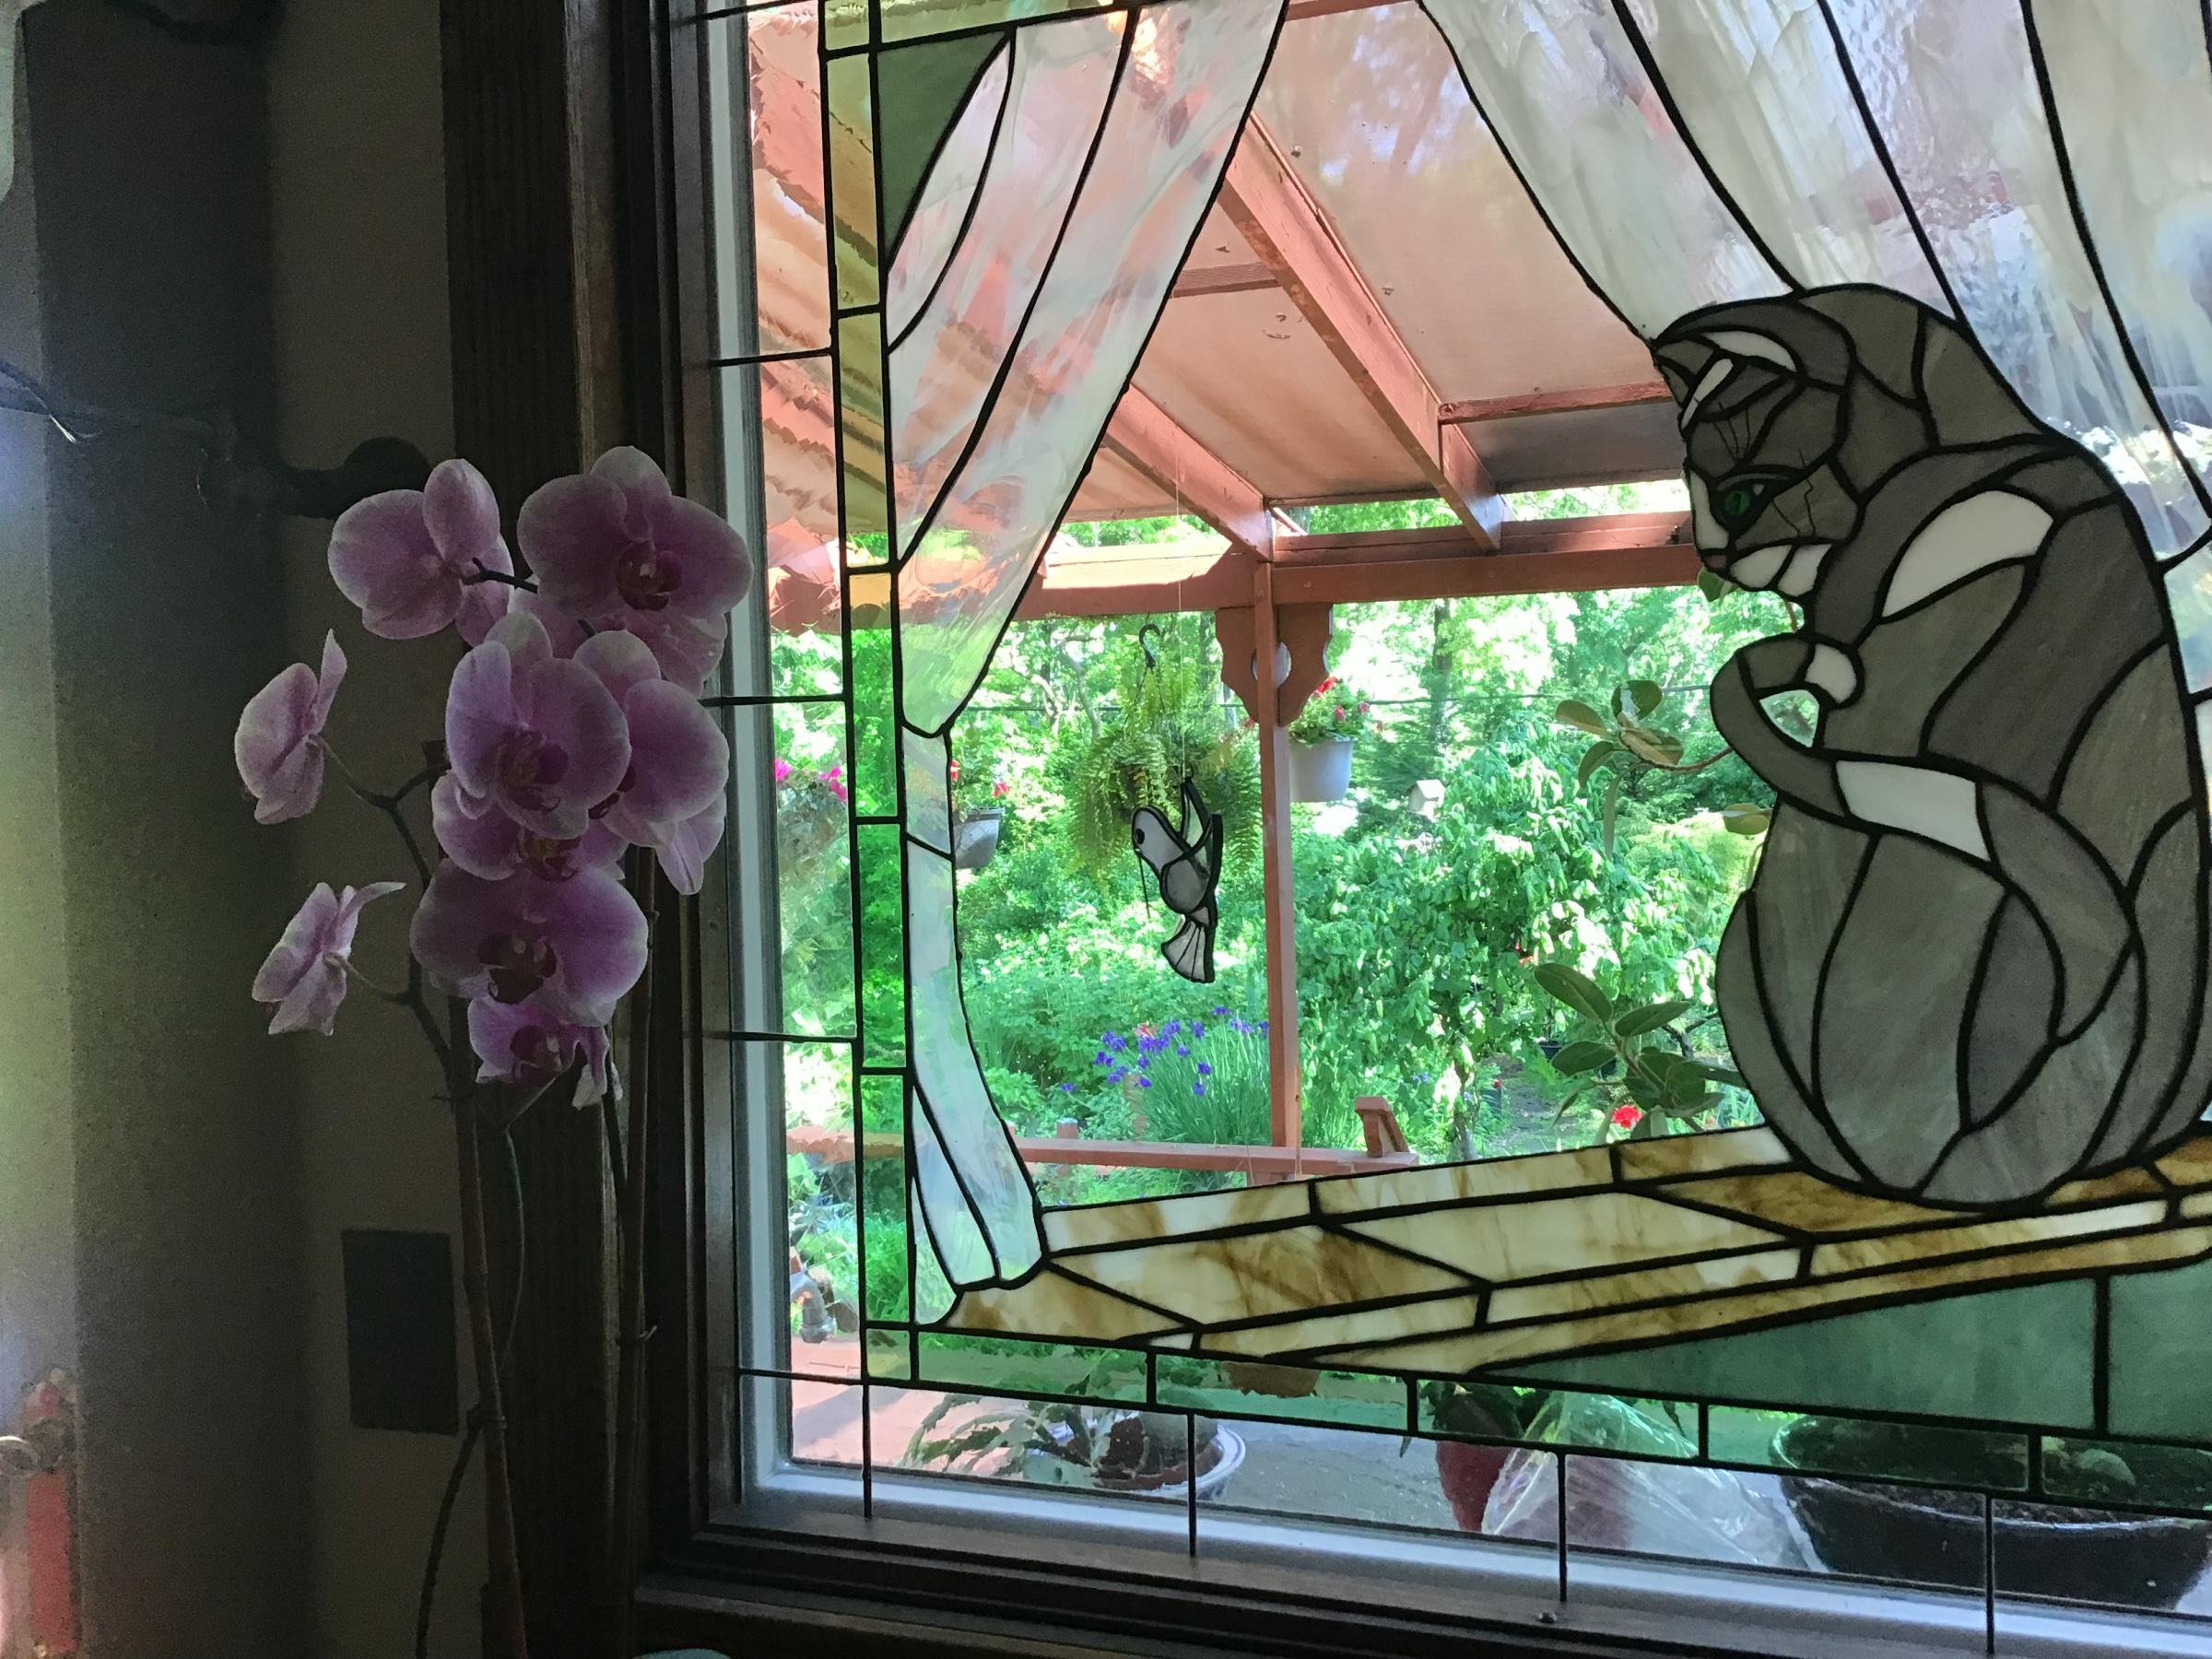 This mornings garden-51009838-4ad4-4591-bc8d-c93dc738814e.jpg